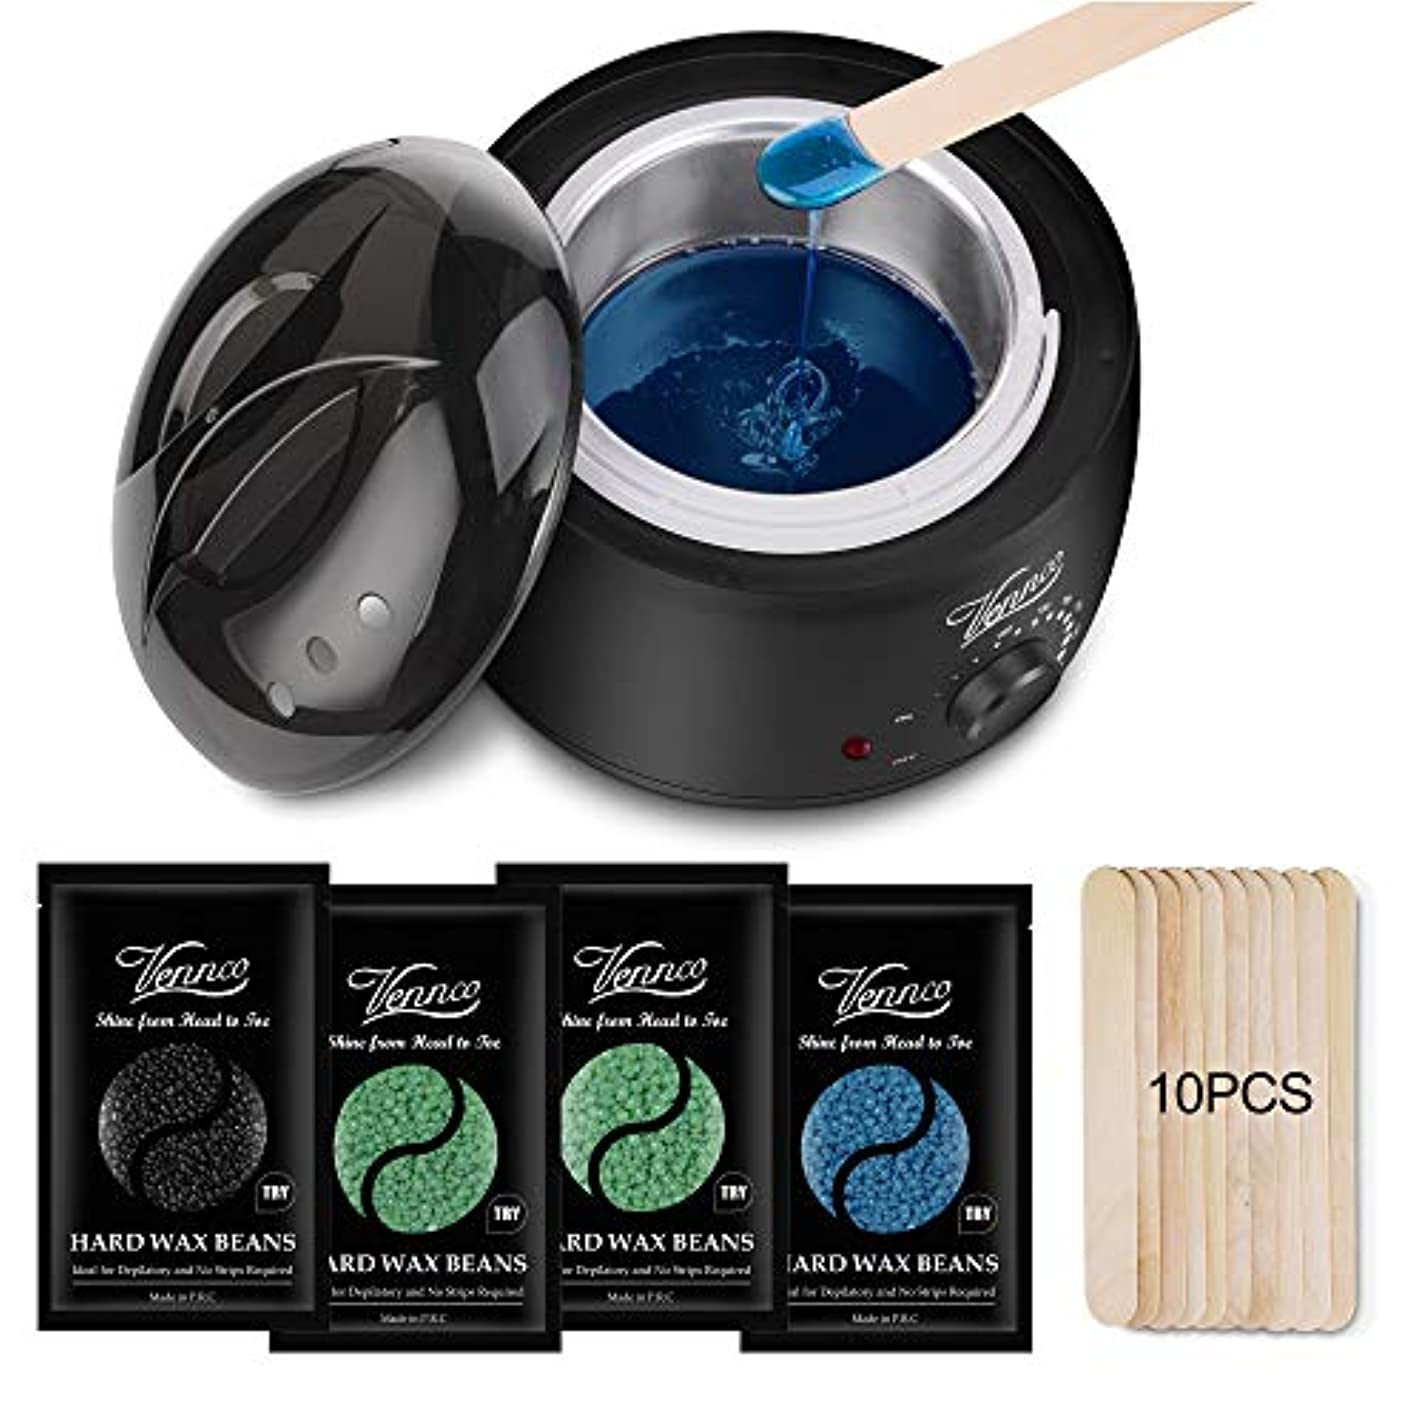 Wax Warmer Hair Removal Kit, Vennco Brazilian Bikini Home Waxing Kit Hair Depilatory Full Body Wax Kit with 4 Bags Hard Wax Beans & 10 Wax Applicator Spatulas